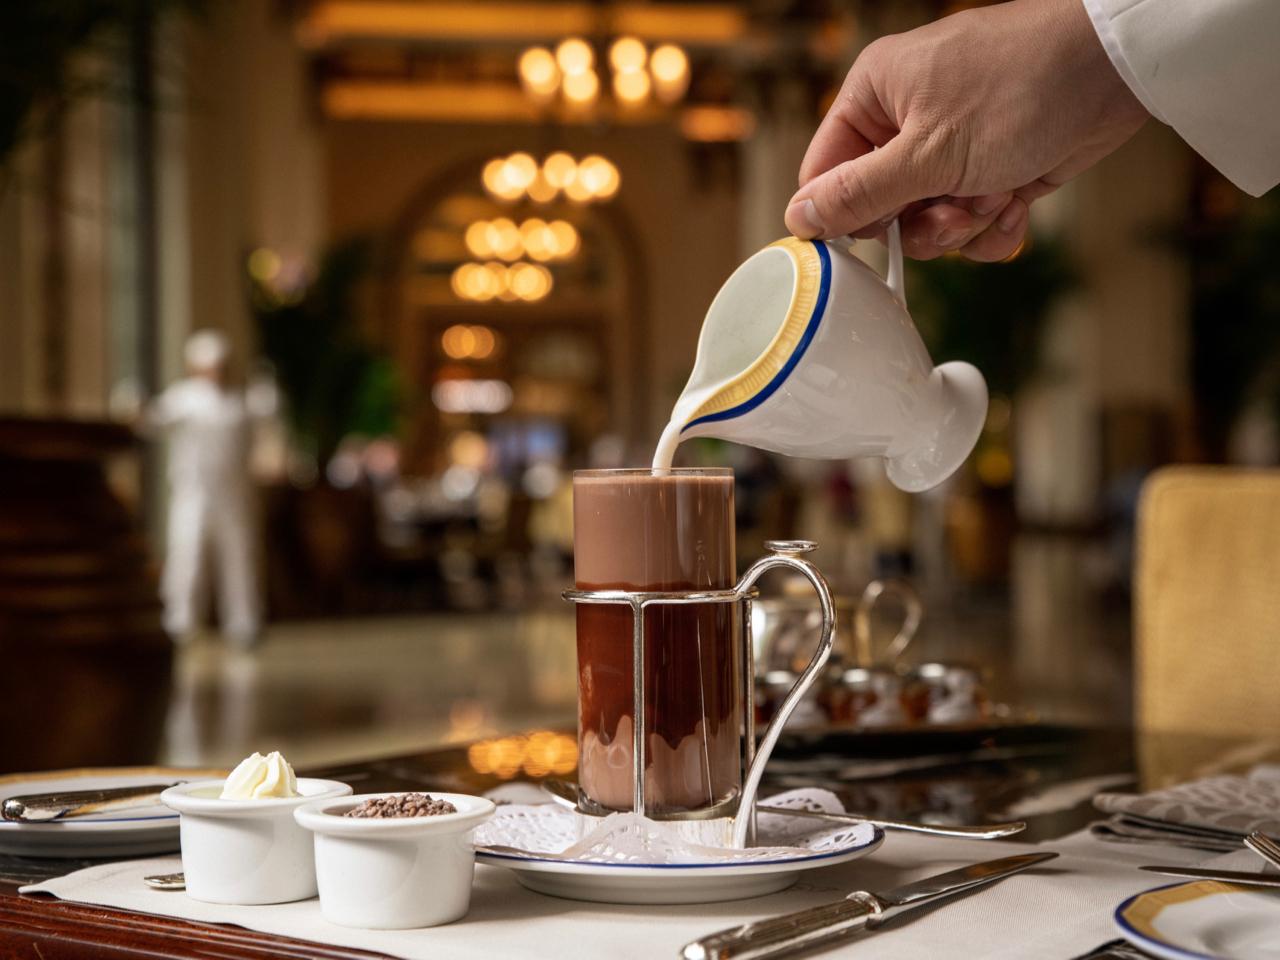 The Peninsula hot chocolate